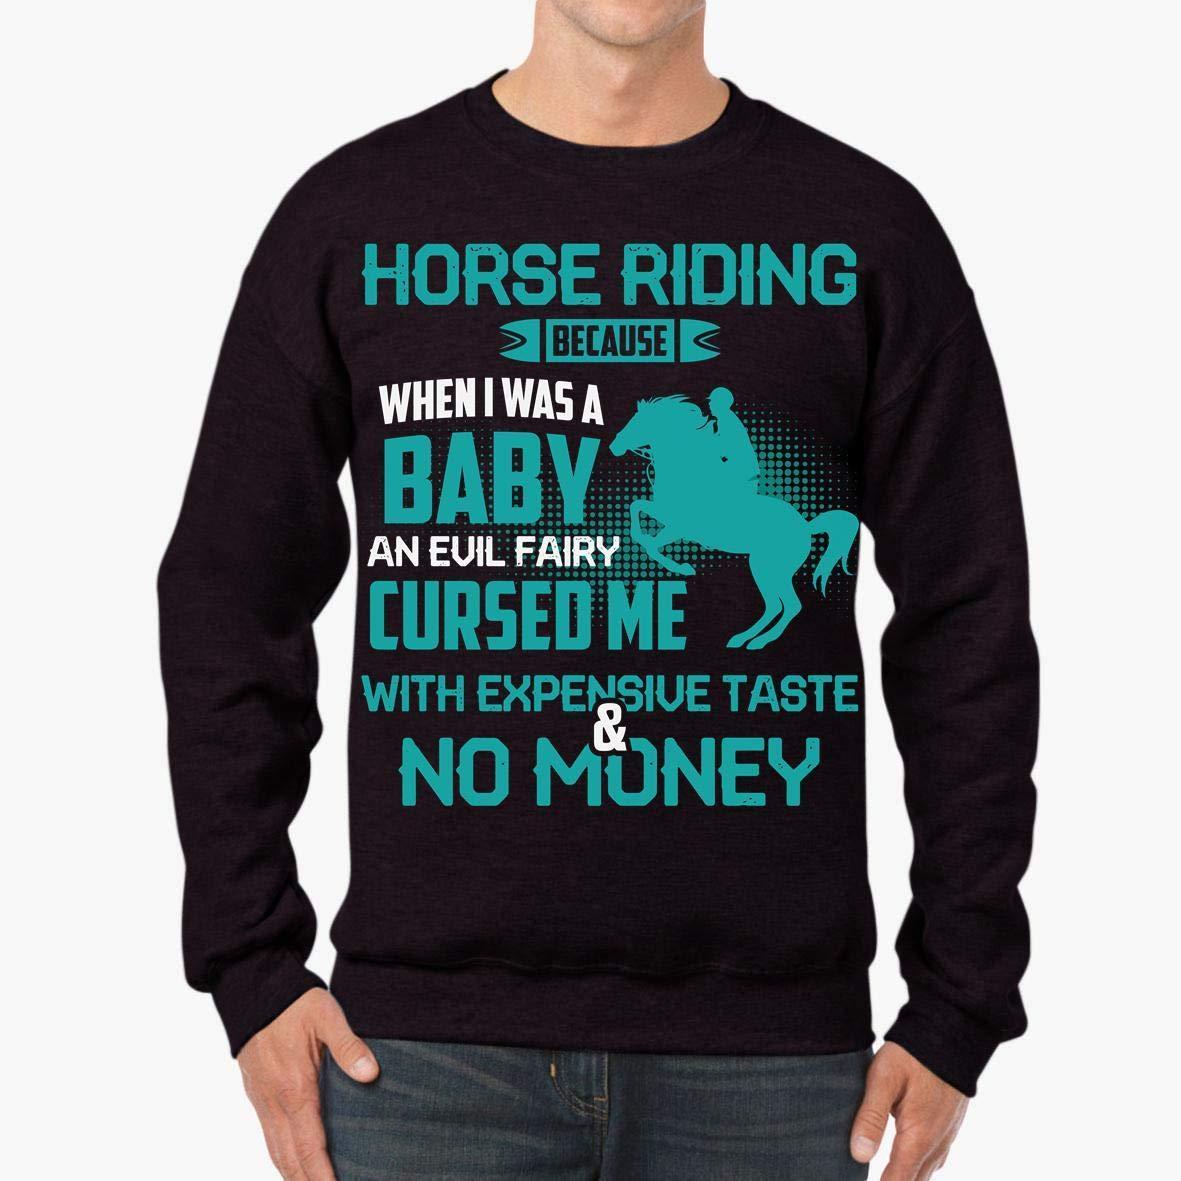 tee Cool Horse Riding Unisex Sweatshirt Expensive Taste and No Money